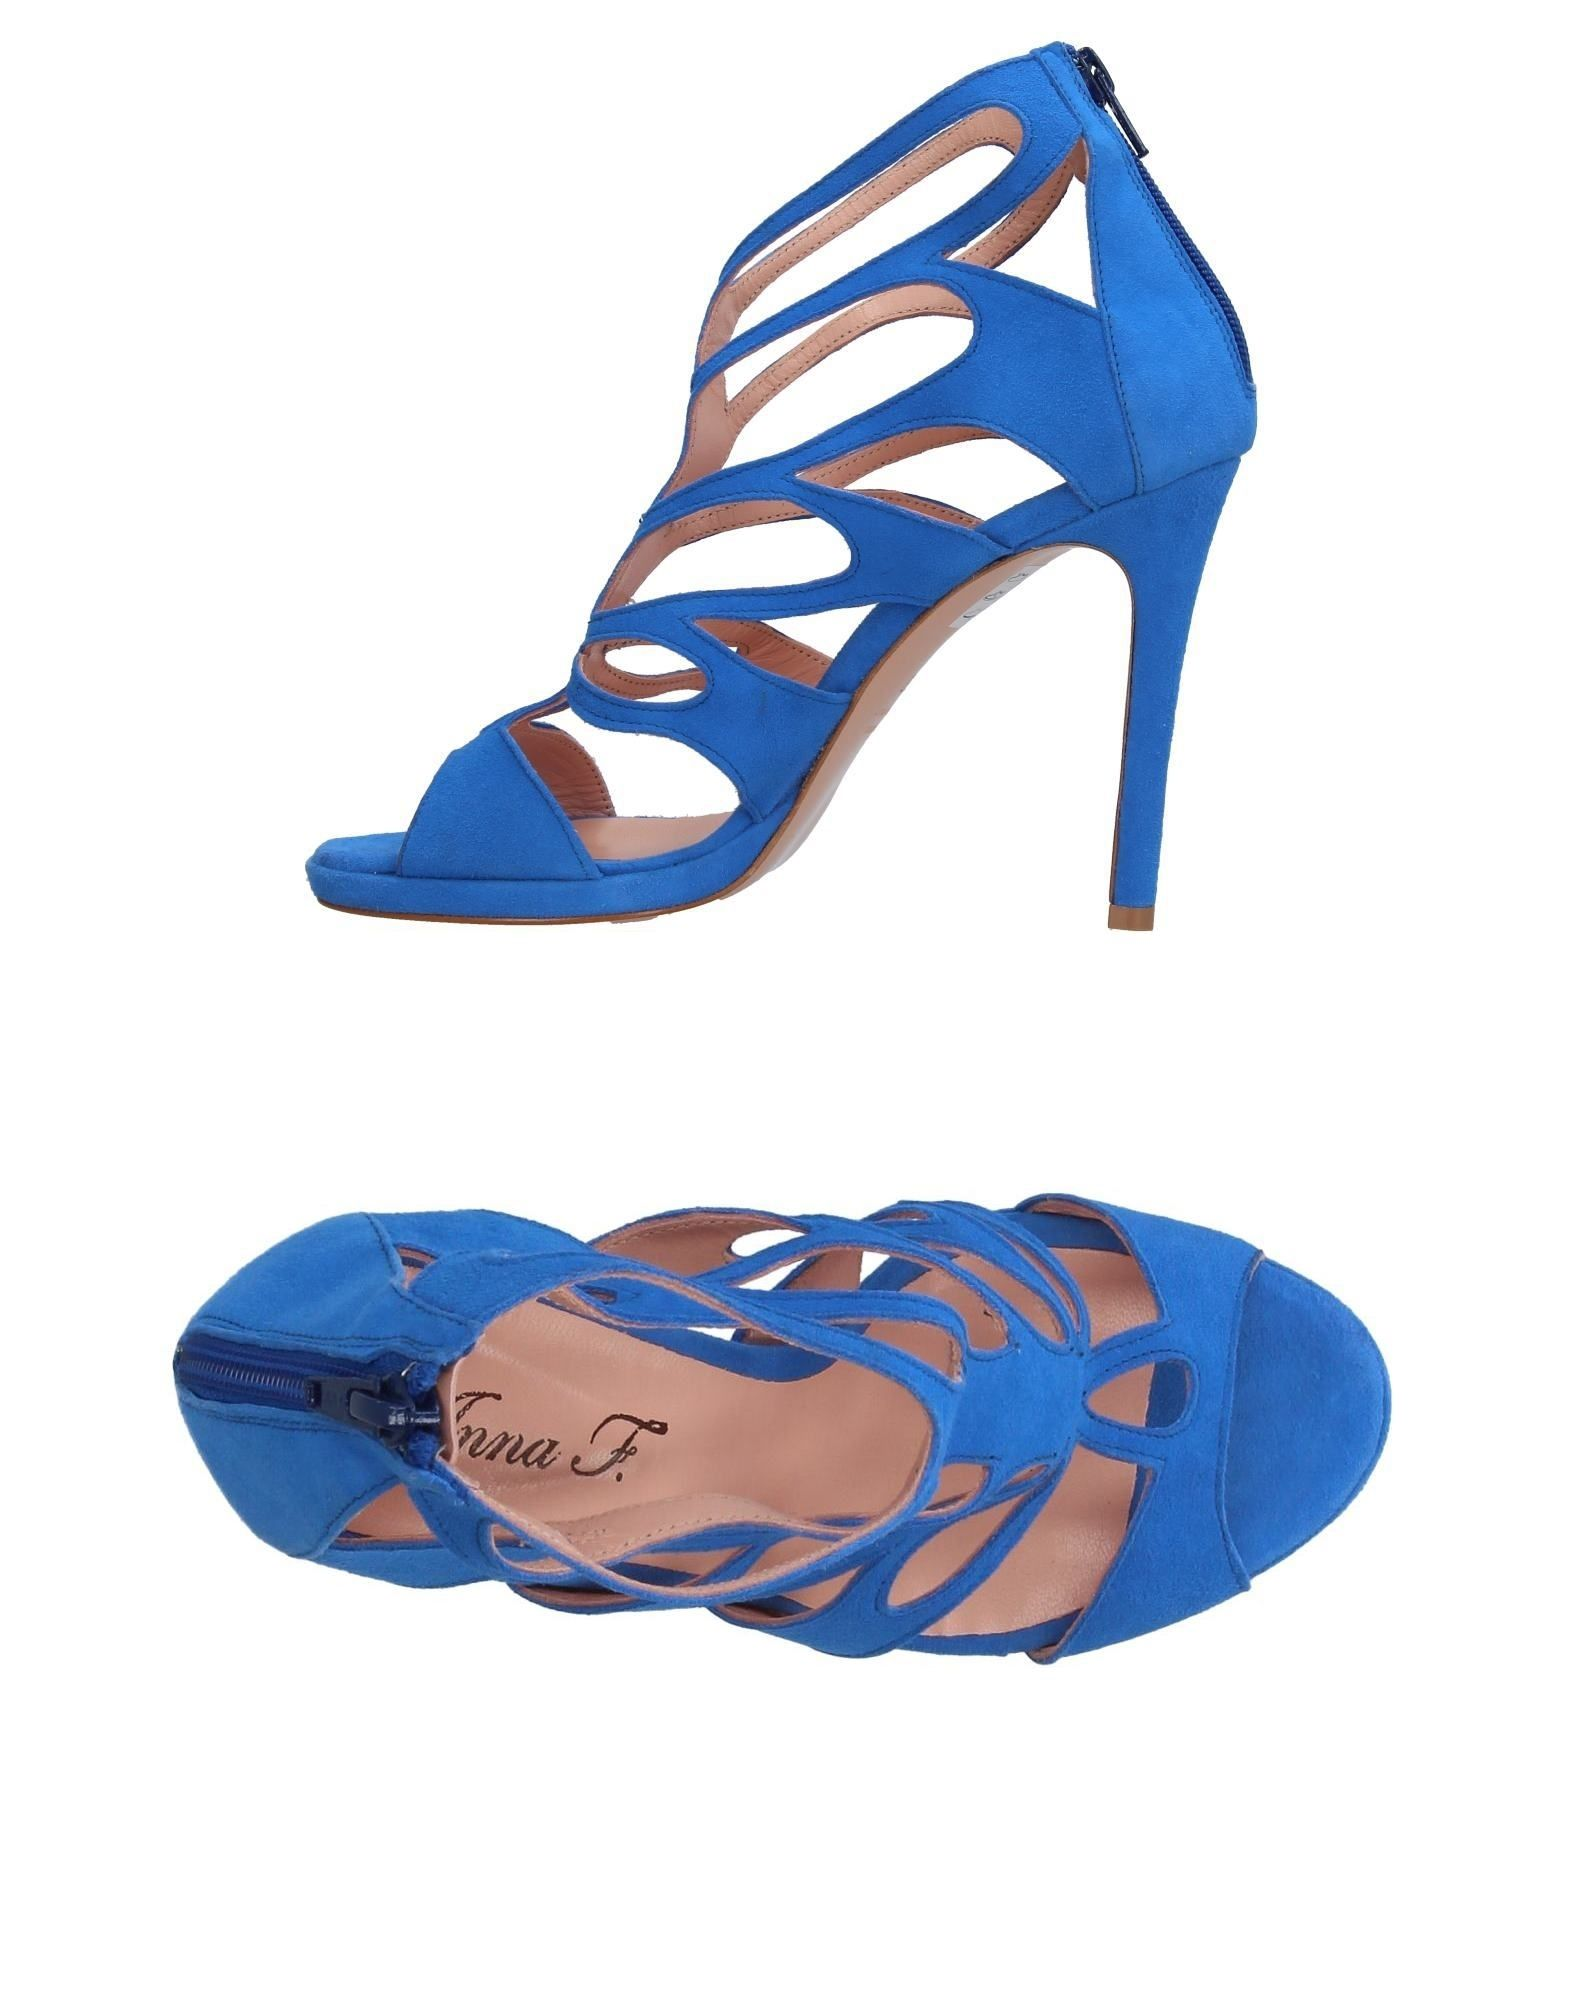 Anna F. Sandalen Damen  11377909ER Gute Qualität Qualität Gute beliebte Schuhe 353148